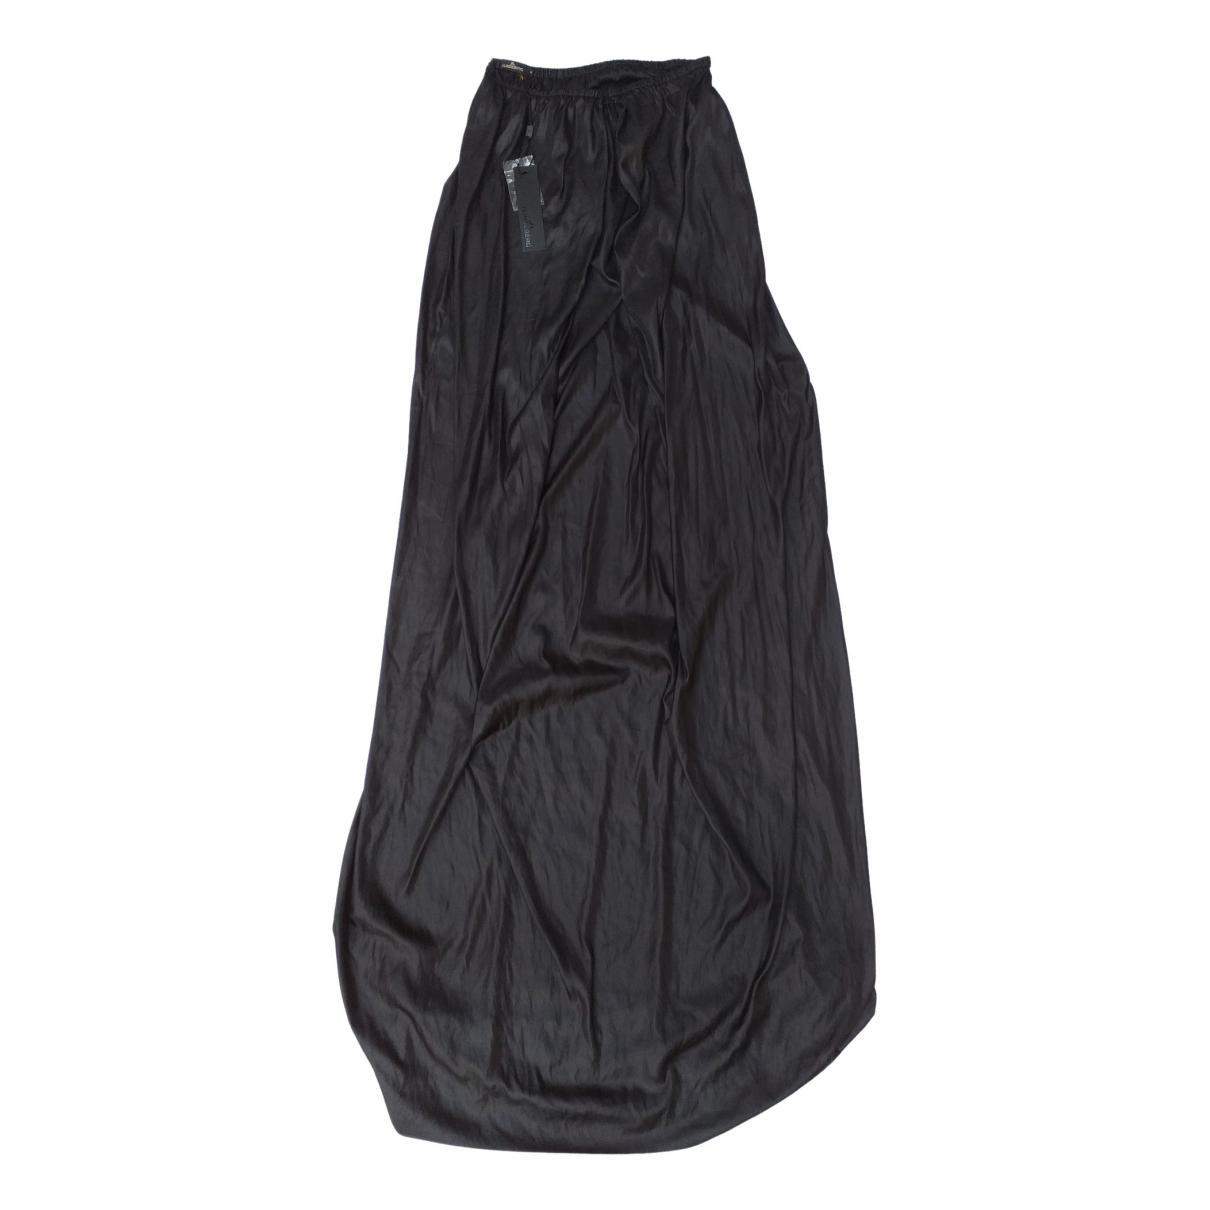 J.lindeberg \N Kleid in  Schwarz Polyester